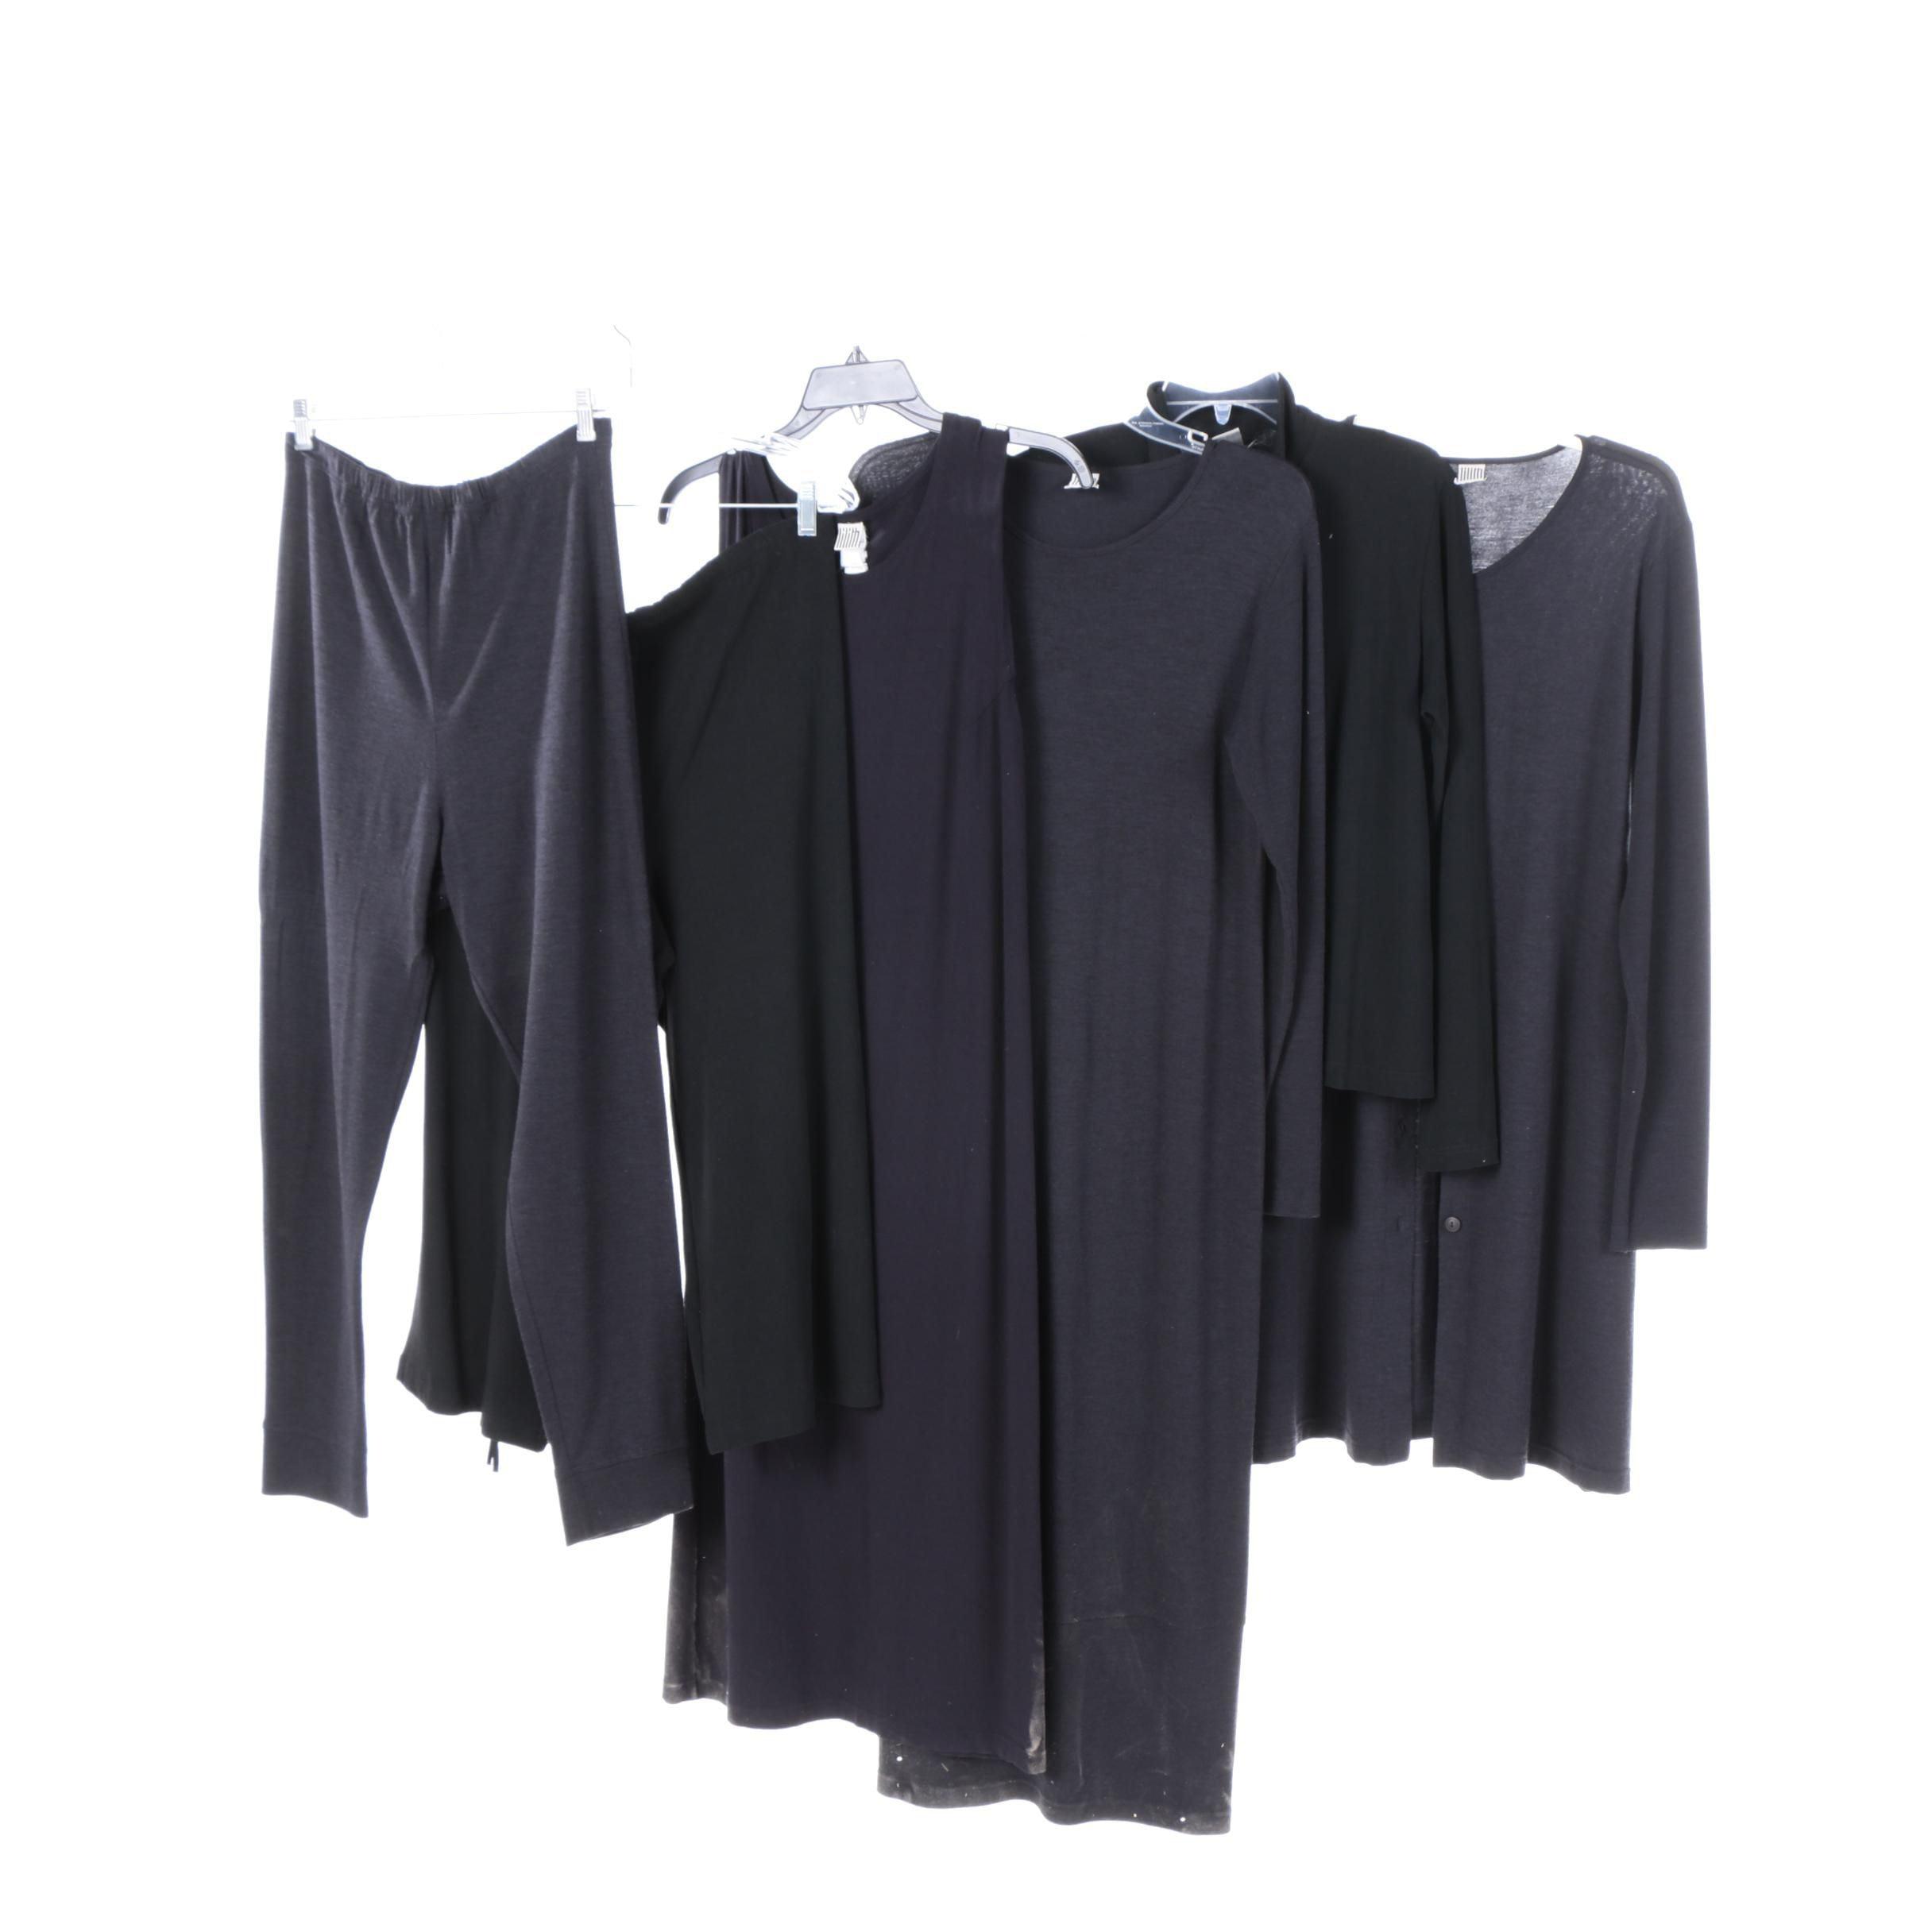 Women's Lilith Paris Black Clothing Separates